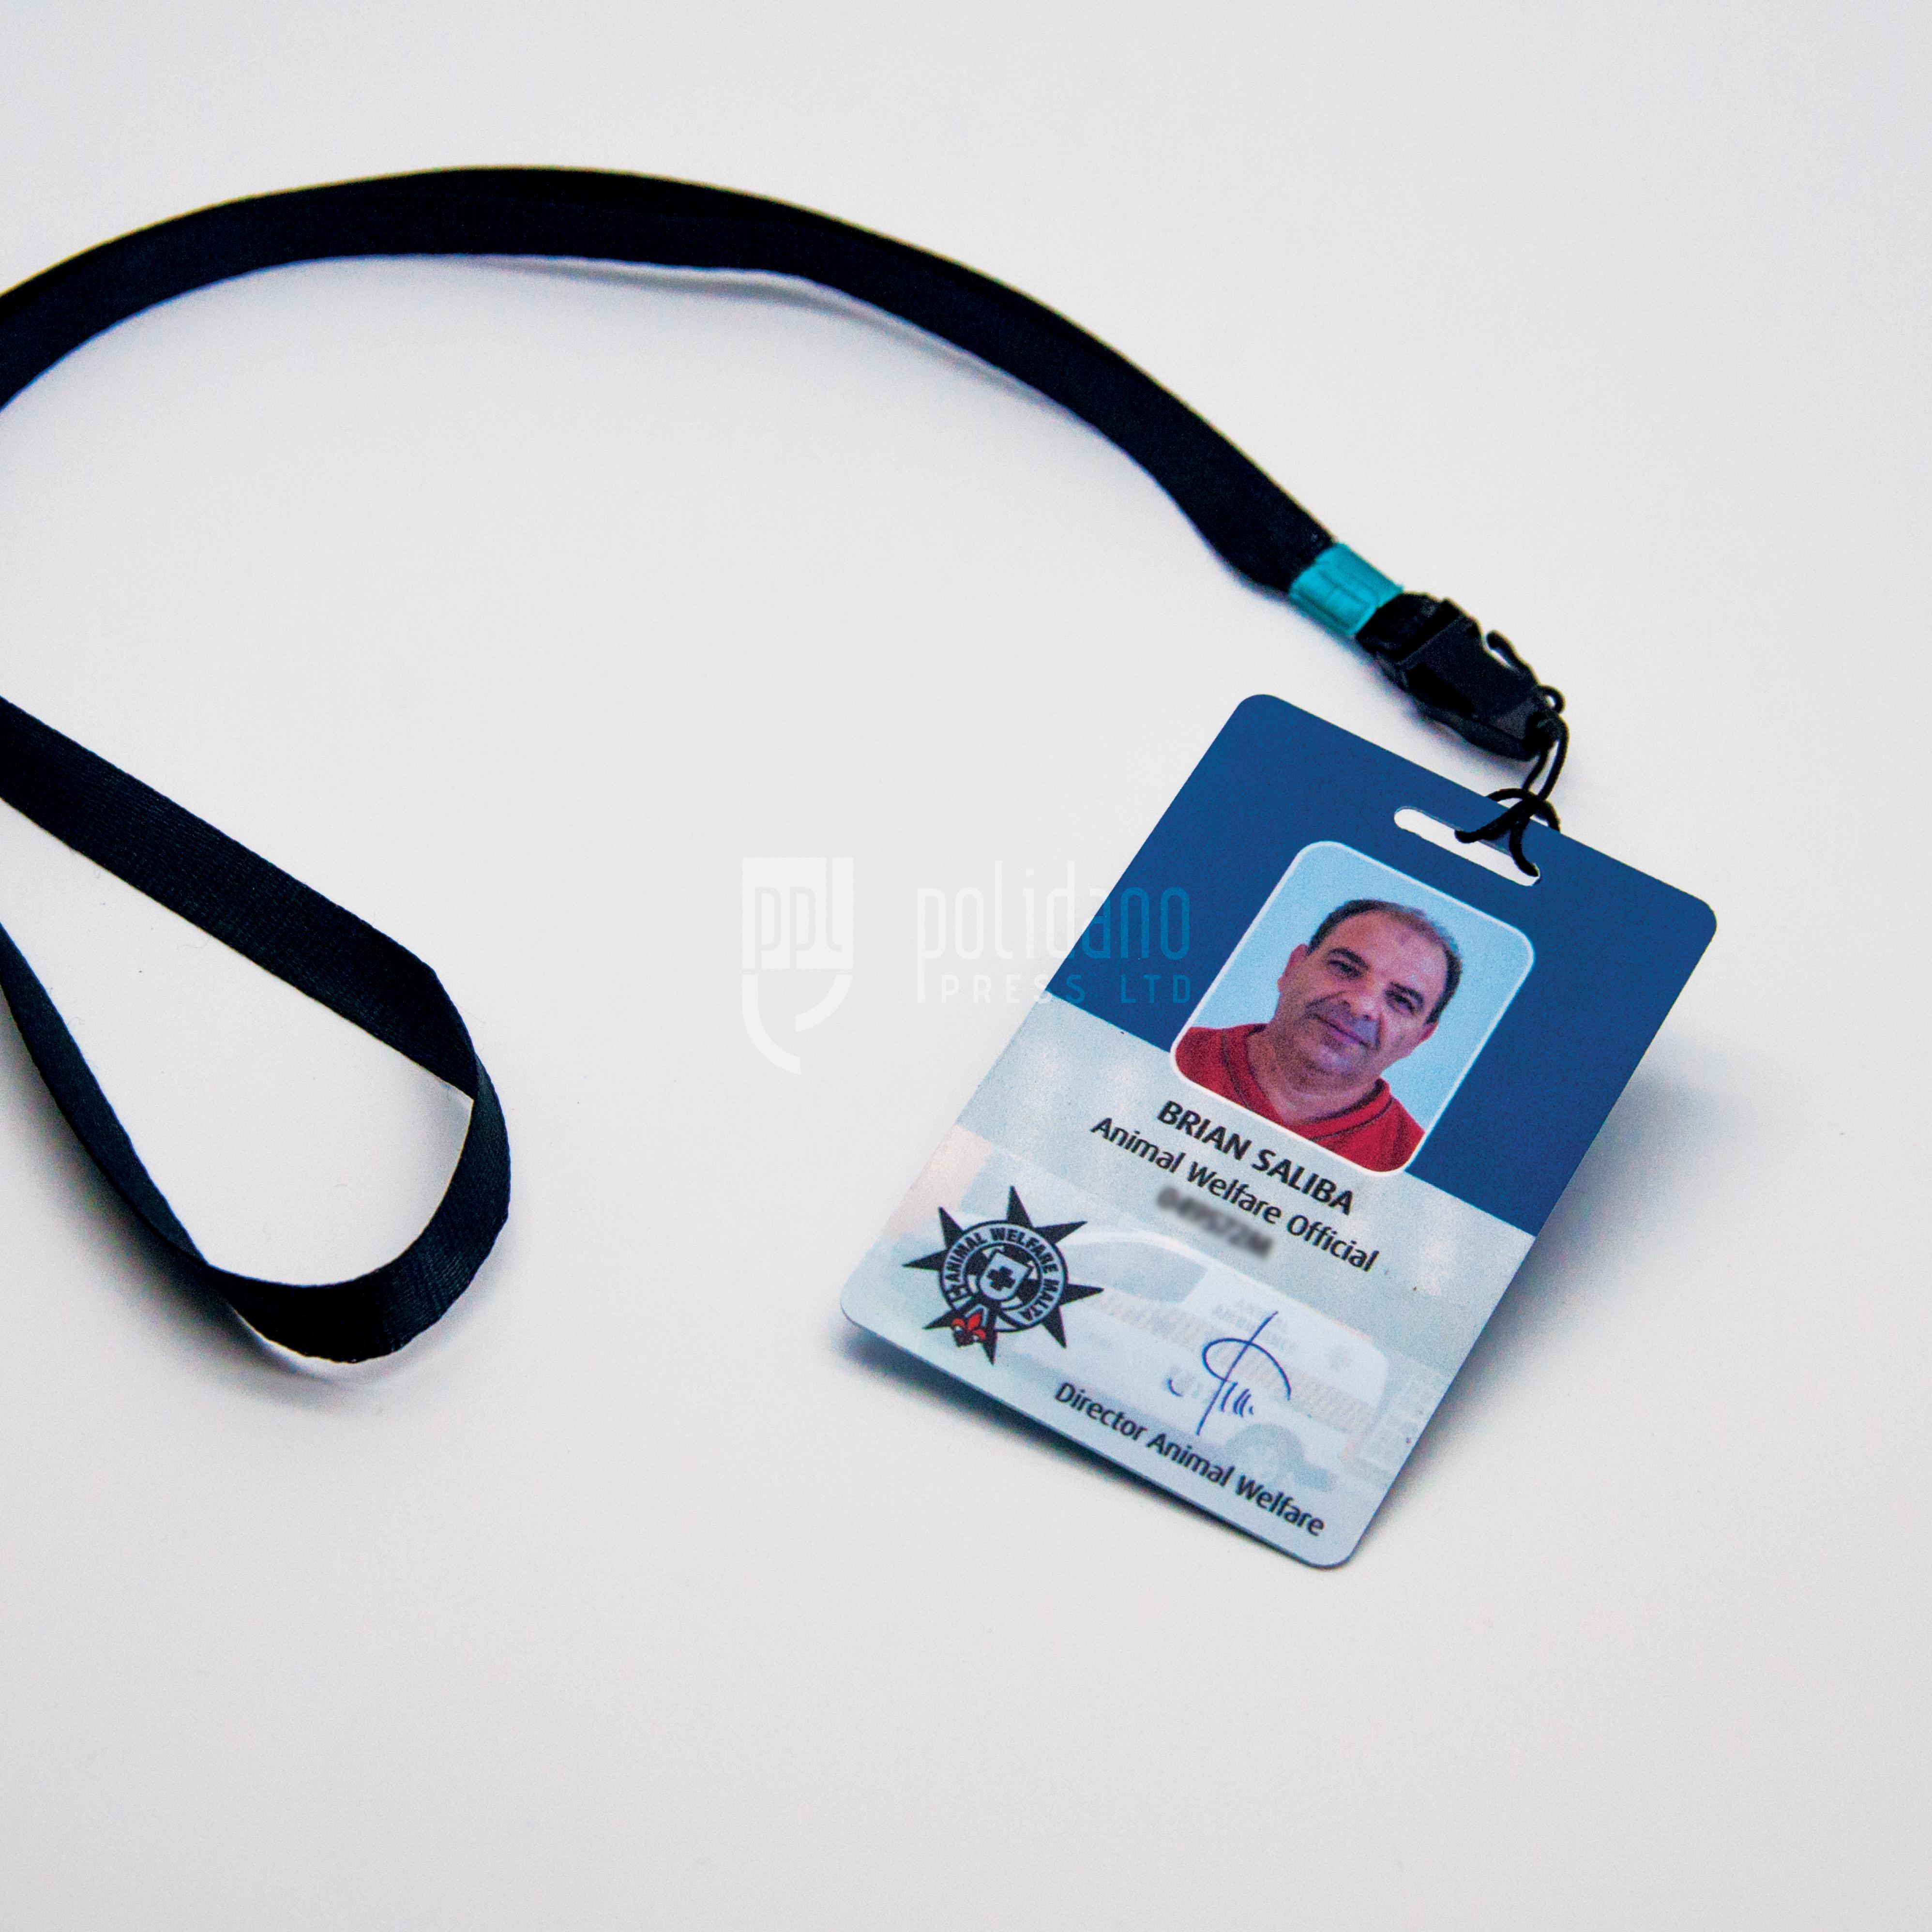 Employee PVC cards